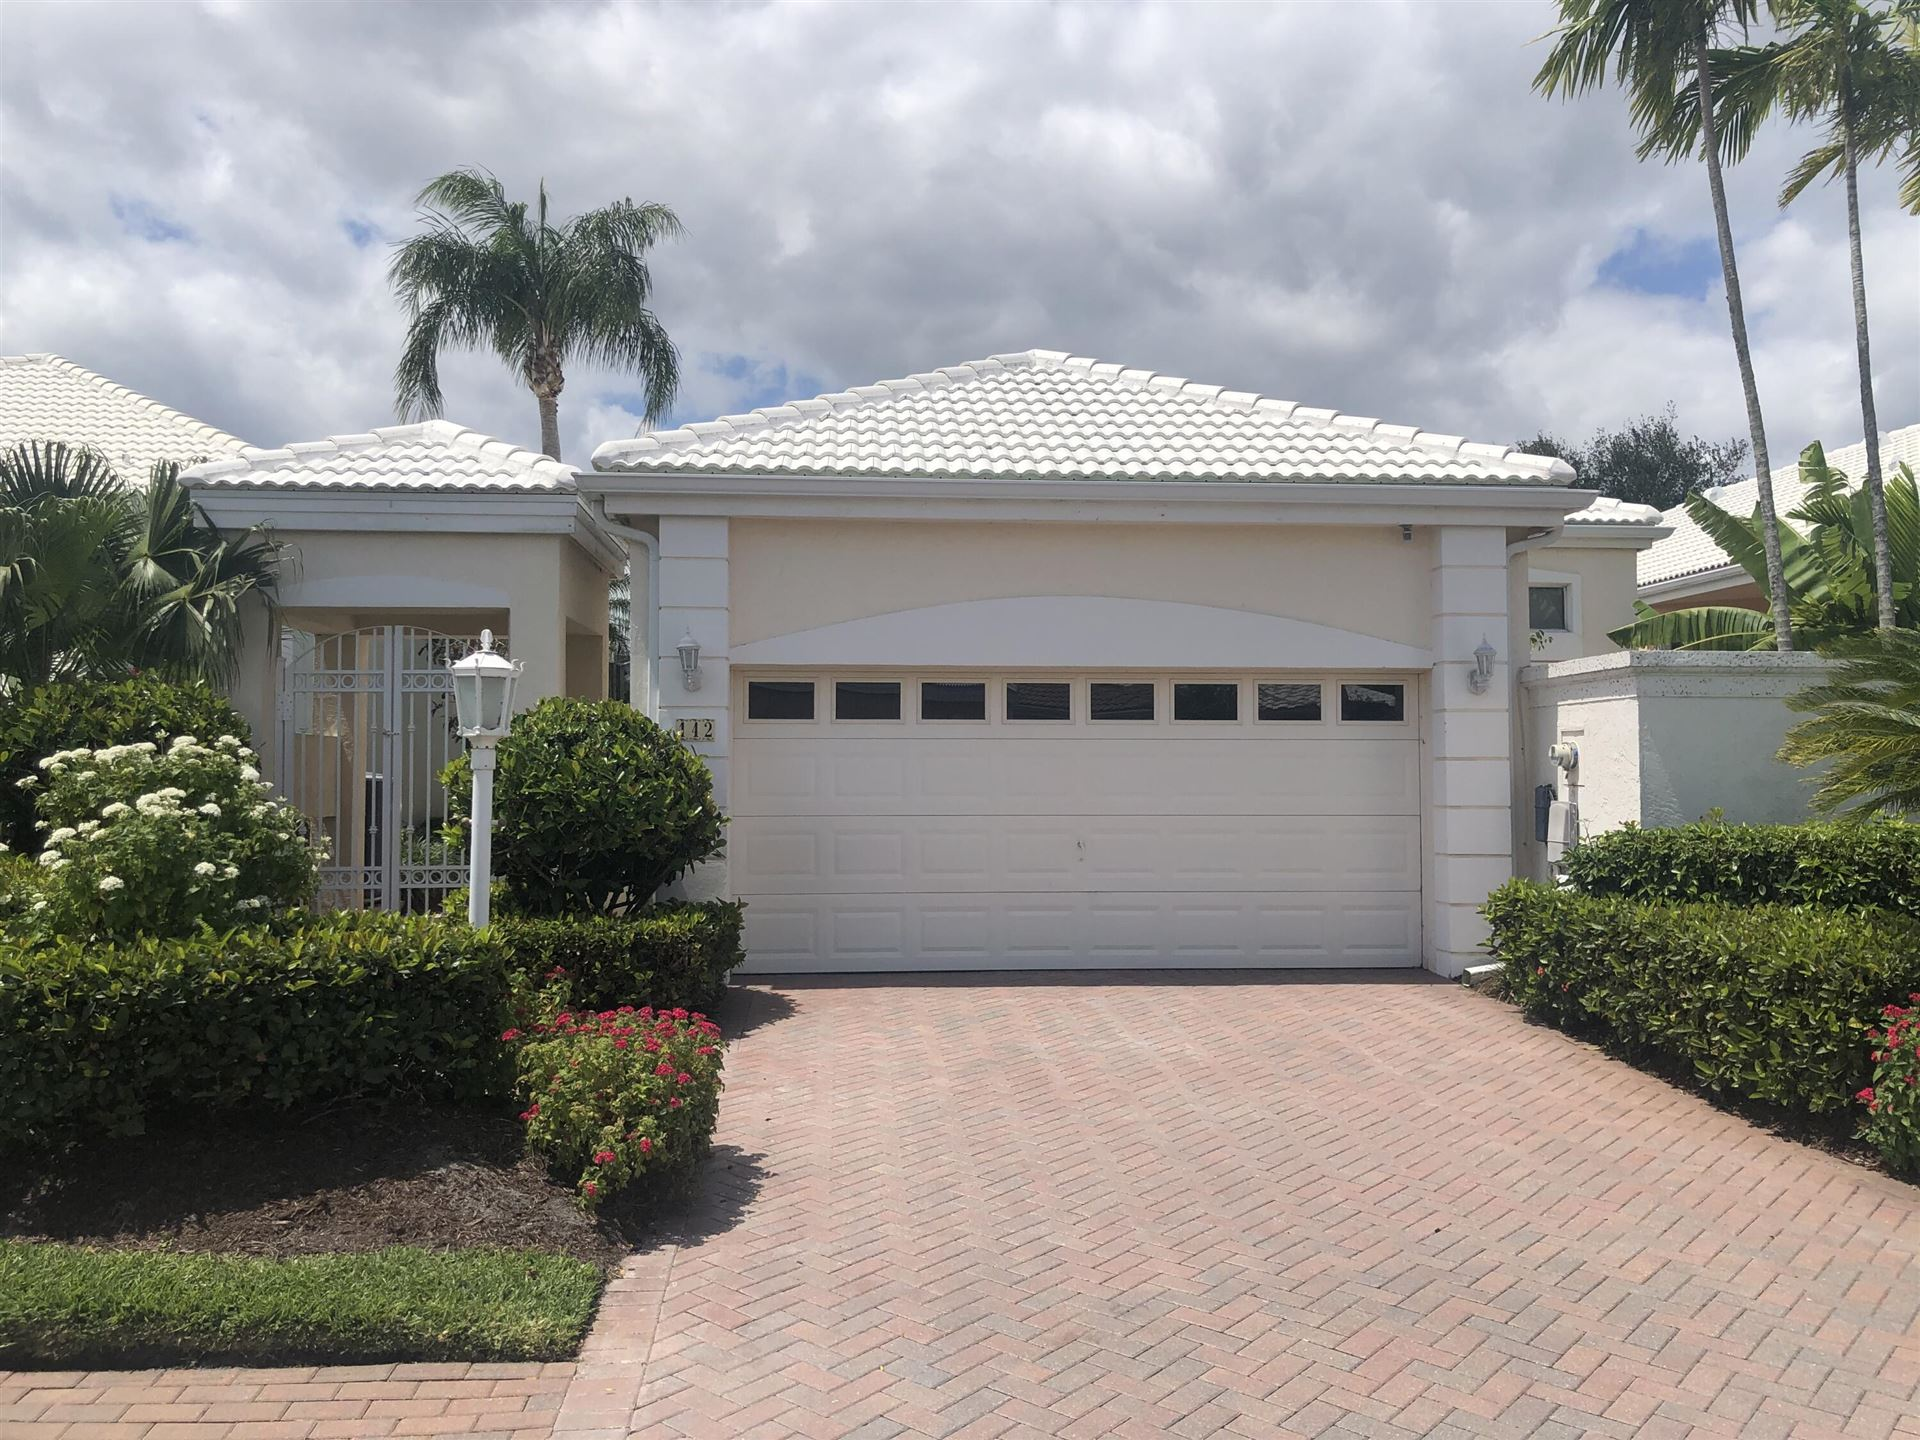 Photo of 142 Coral Cay Drive, Palm Beach Gardens, FL 33418 (MLS # RX-10705162)